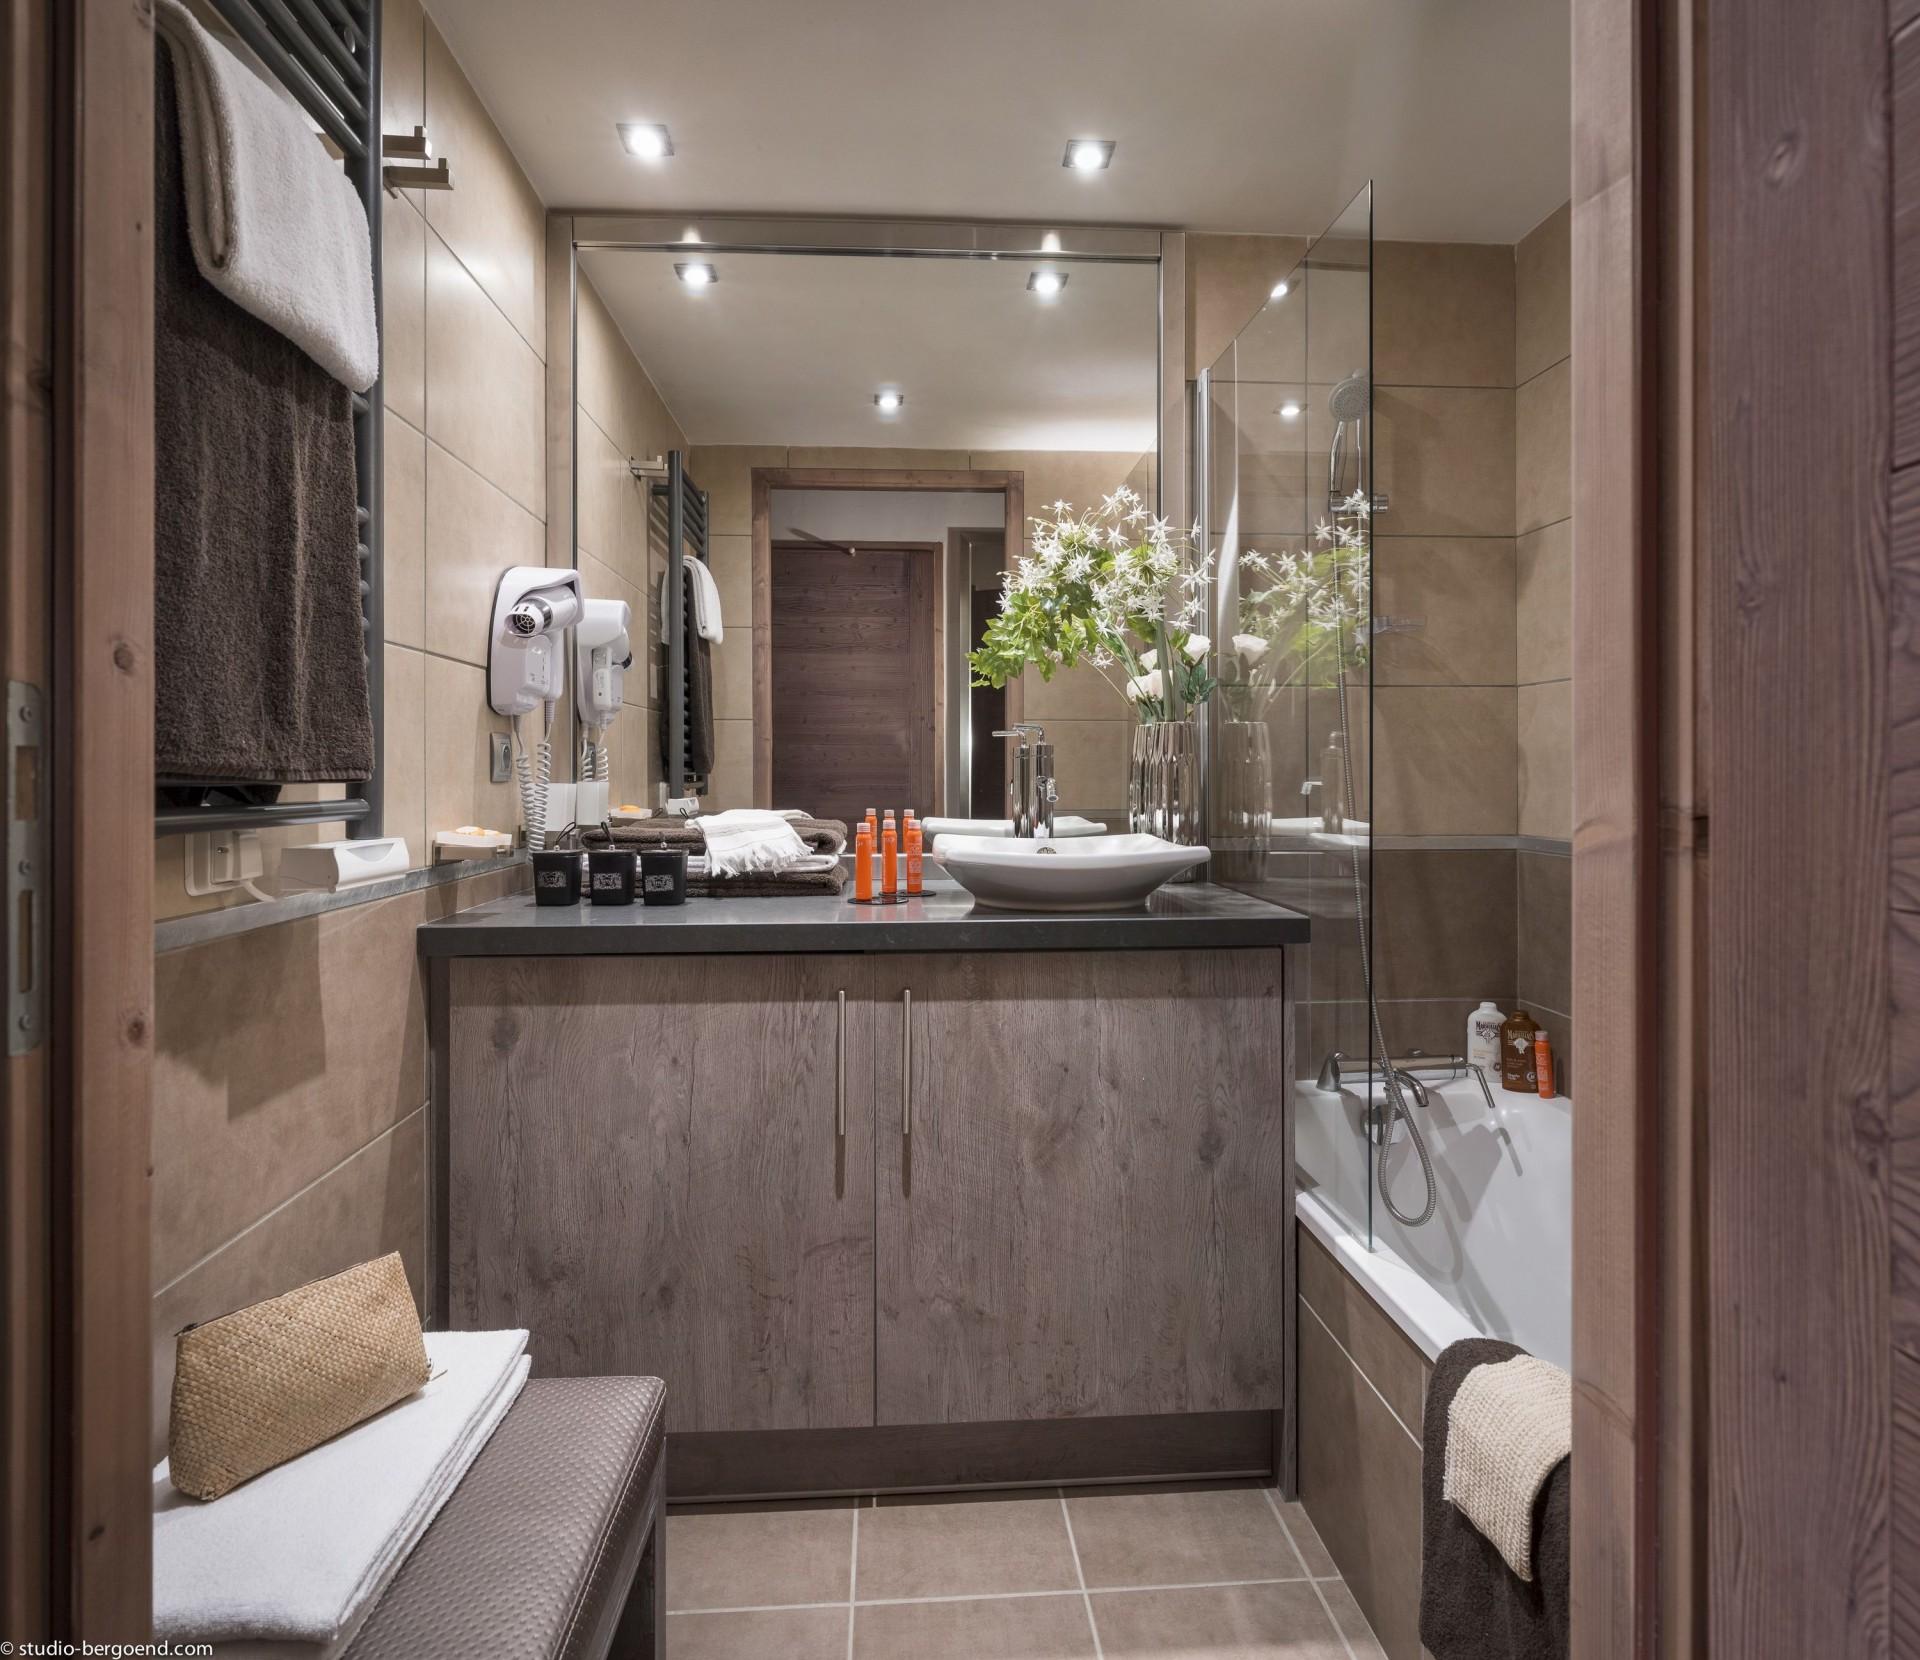 Flane Rental Apartment Luxury Fangite Duplex Bathroom